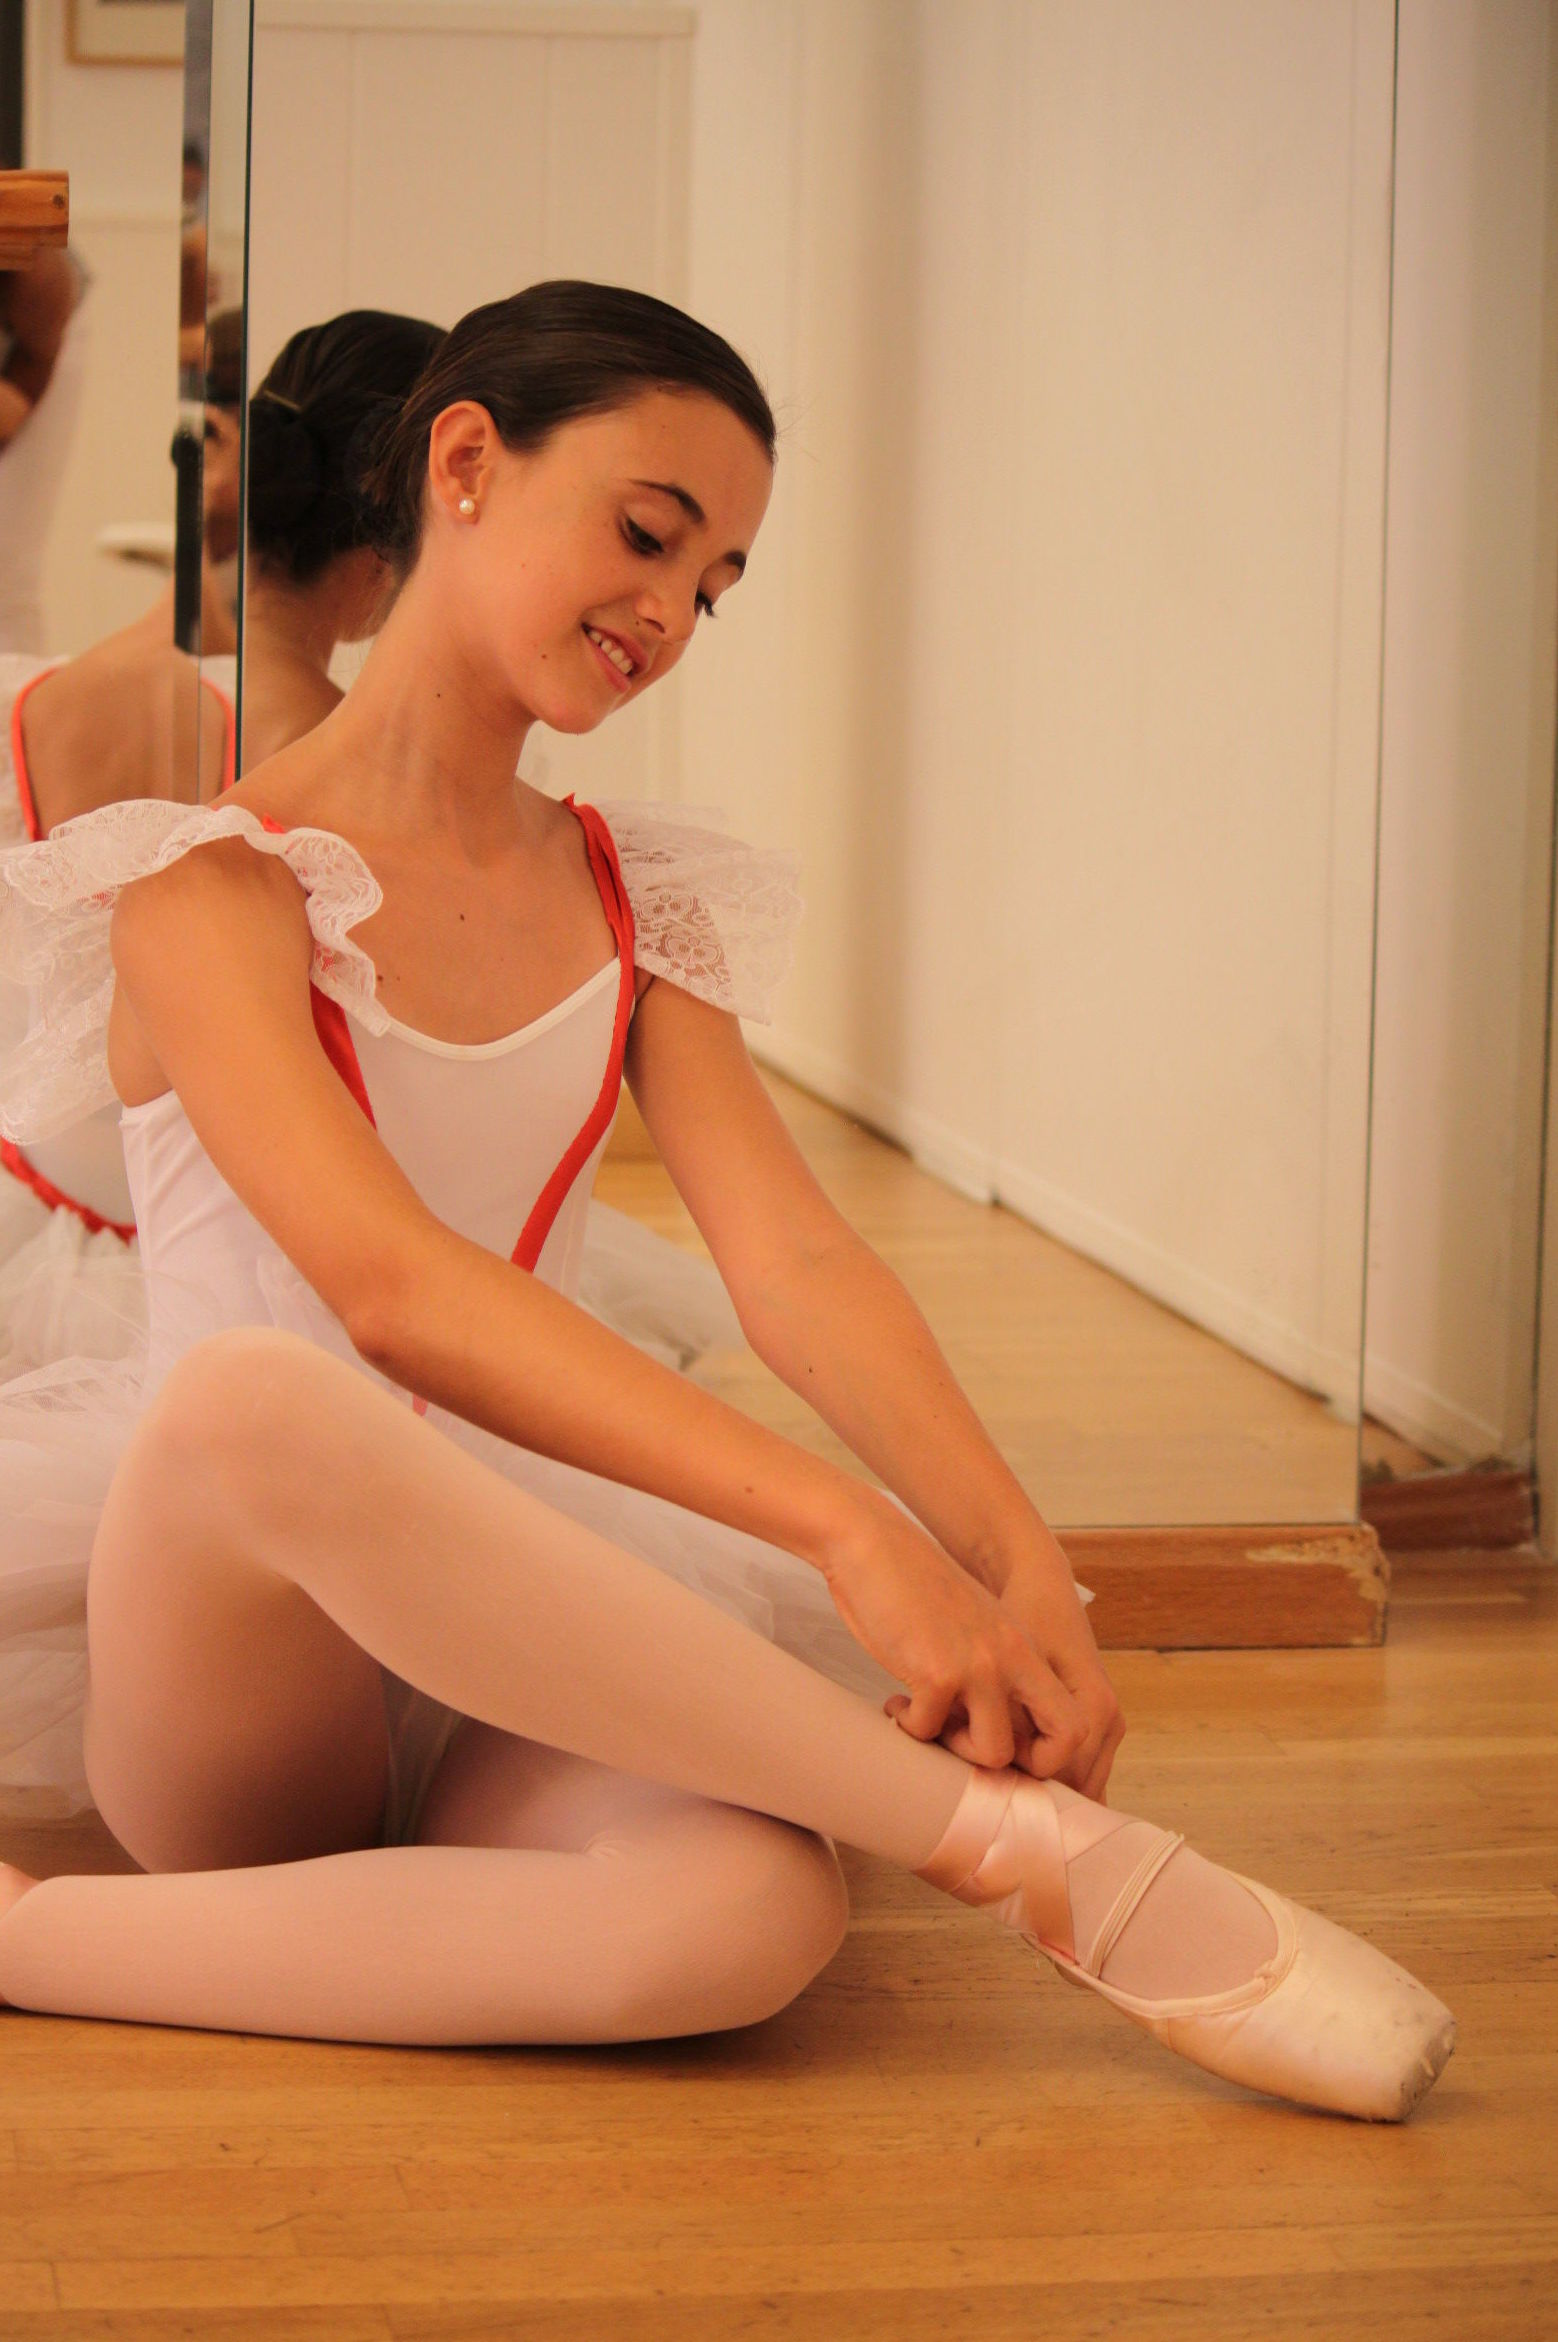 clases de baile a la carta Aravaca Madrid